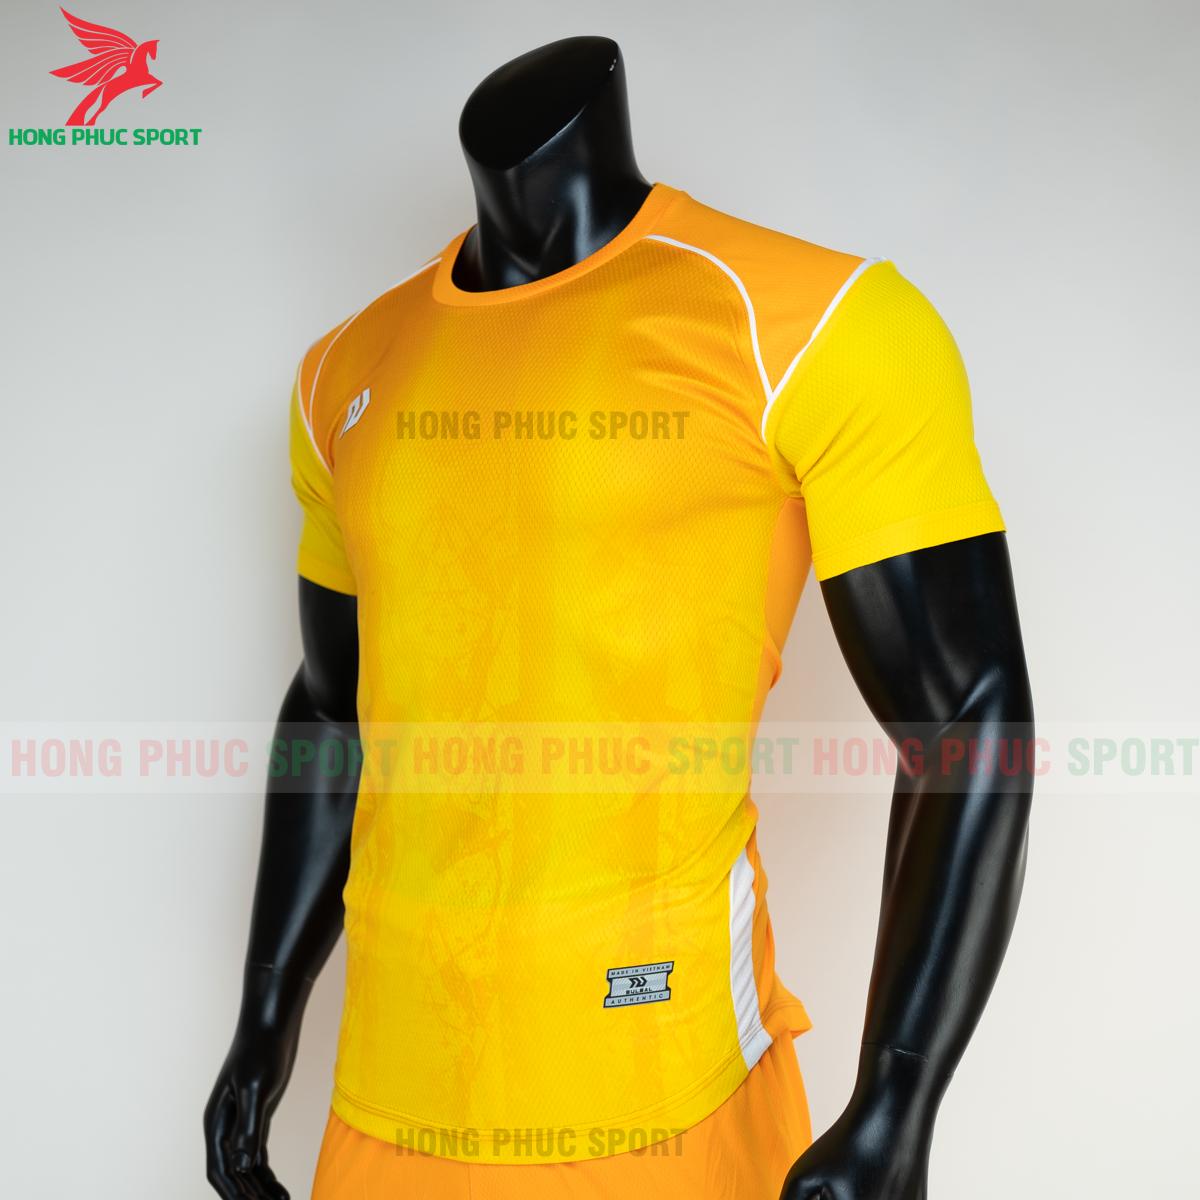 https://cdn.hongphucsport.com/unsafe/s4.shopbay.vn/files/285/ao-bong-da-khong-logo-bulbal-hades-mau-vang-3-604f31e9e5324.png